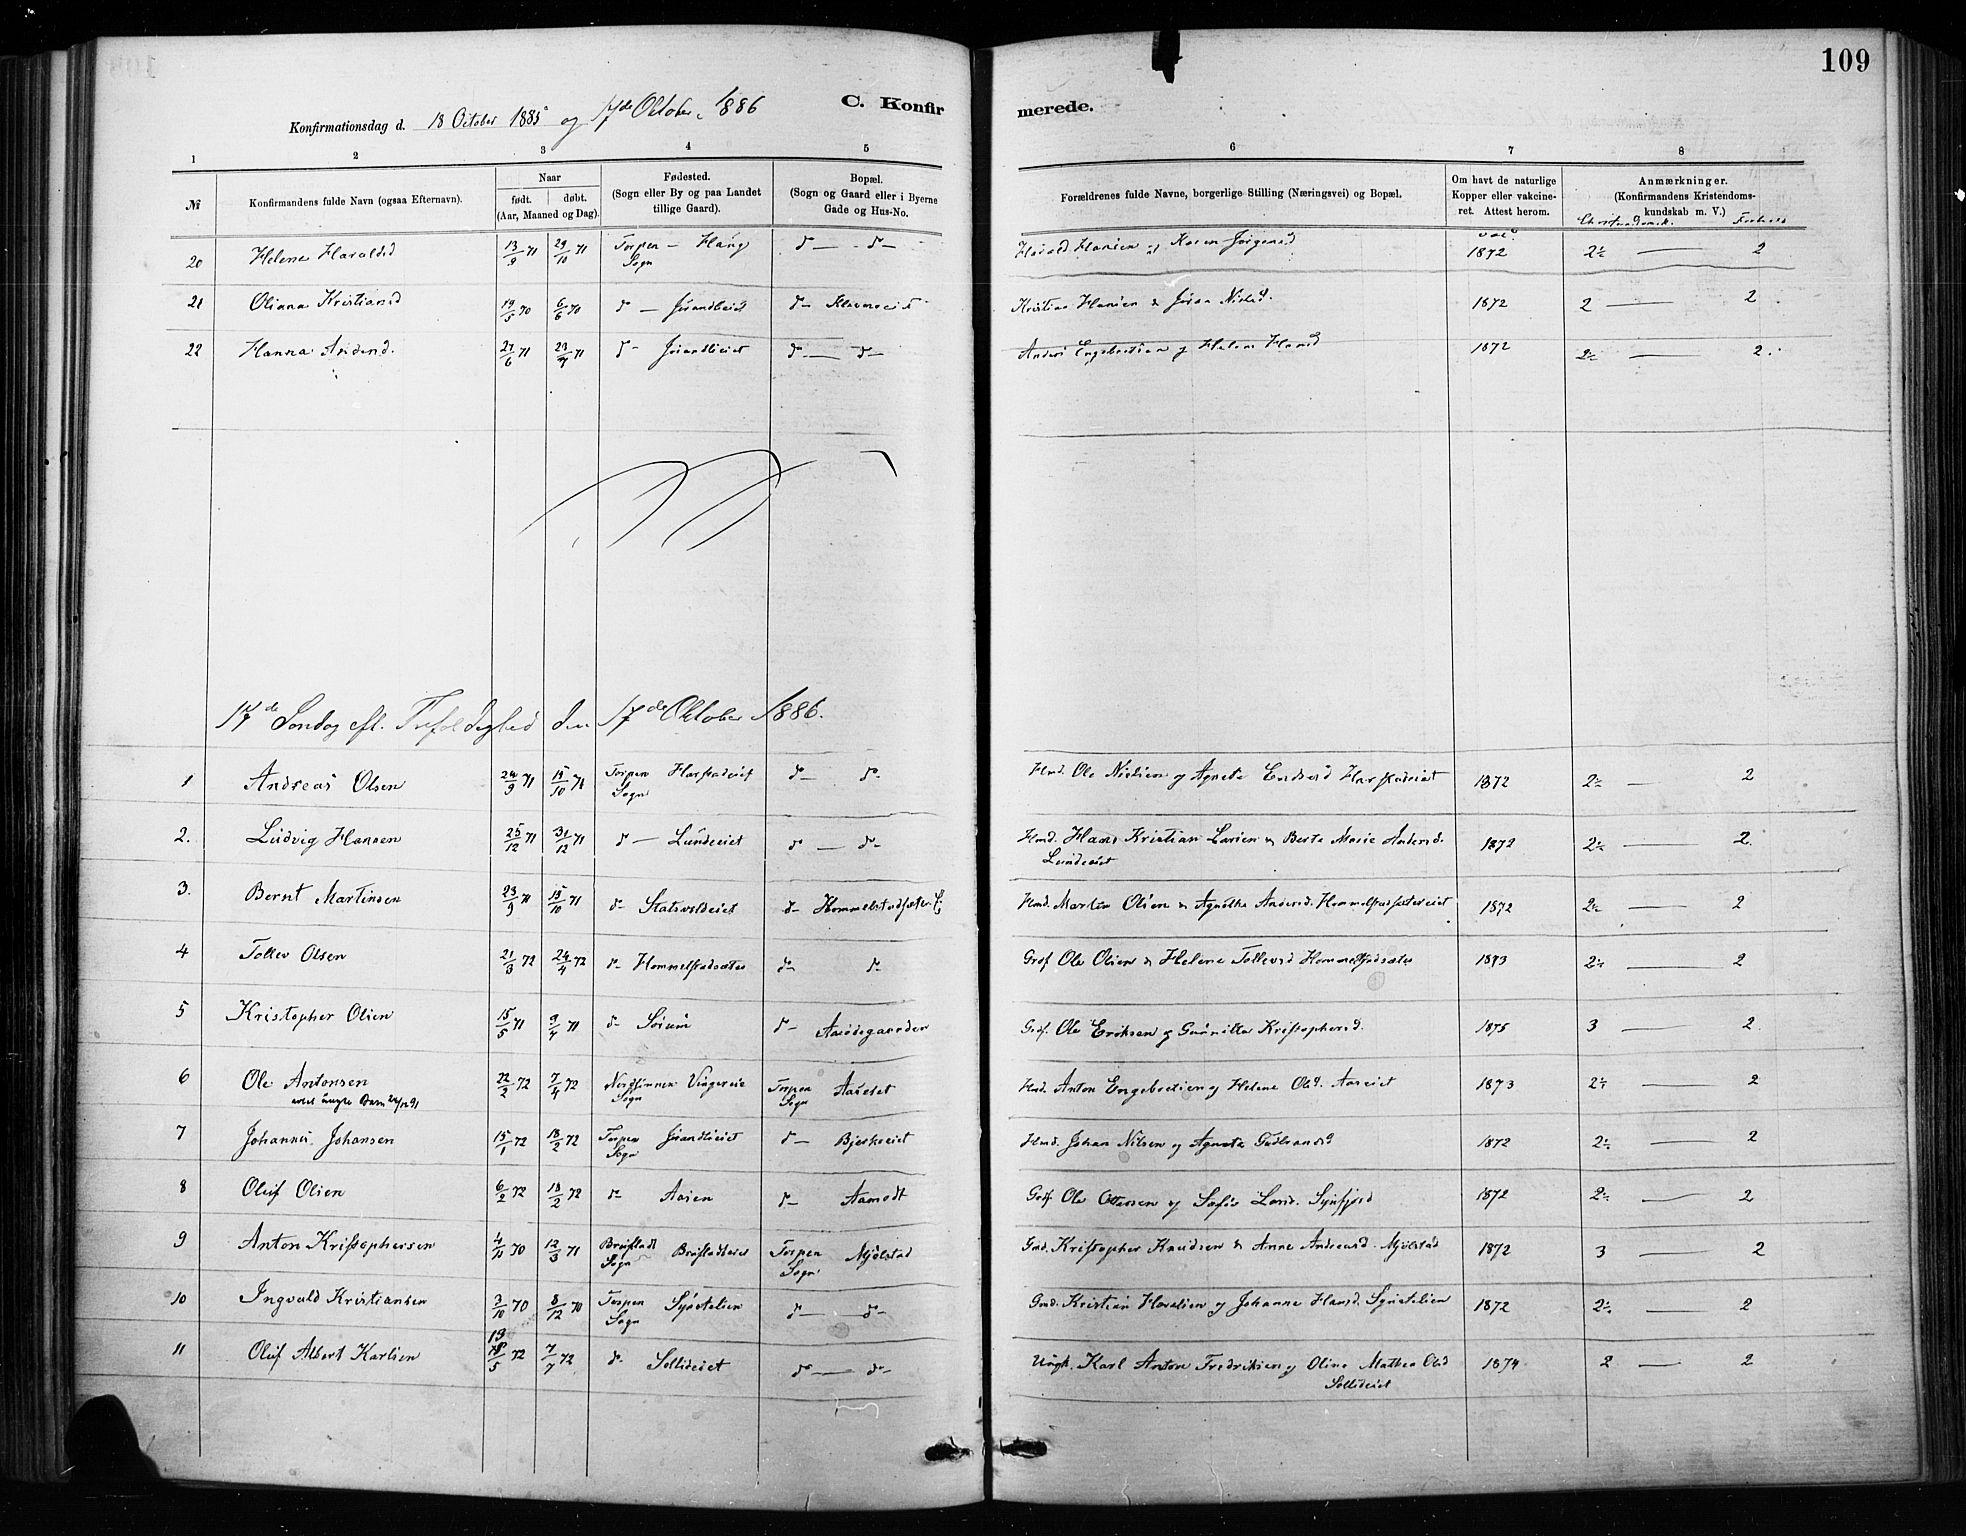 SAH, Nordre Land prestekontor, Ministerialbok nr. 4, 1882-1896, s. 109